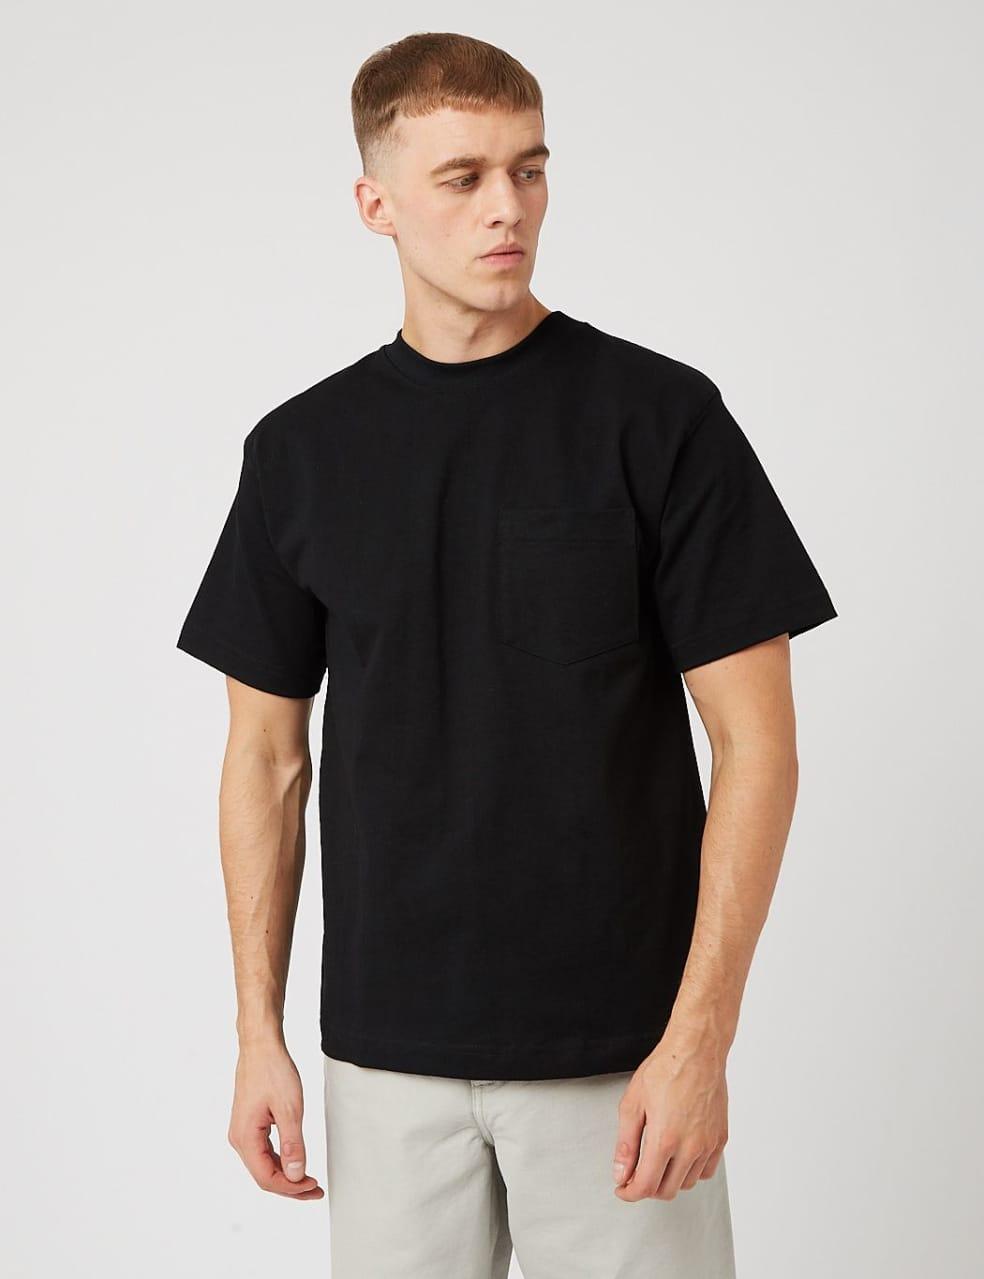 Camber Pocket T-shirt (8oz) - Black | T-Shirt by Camber USA 1